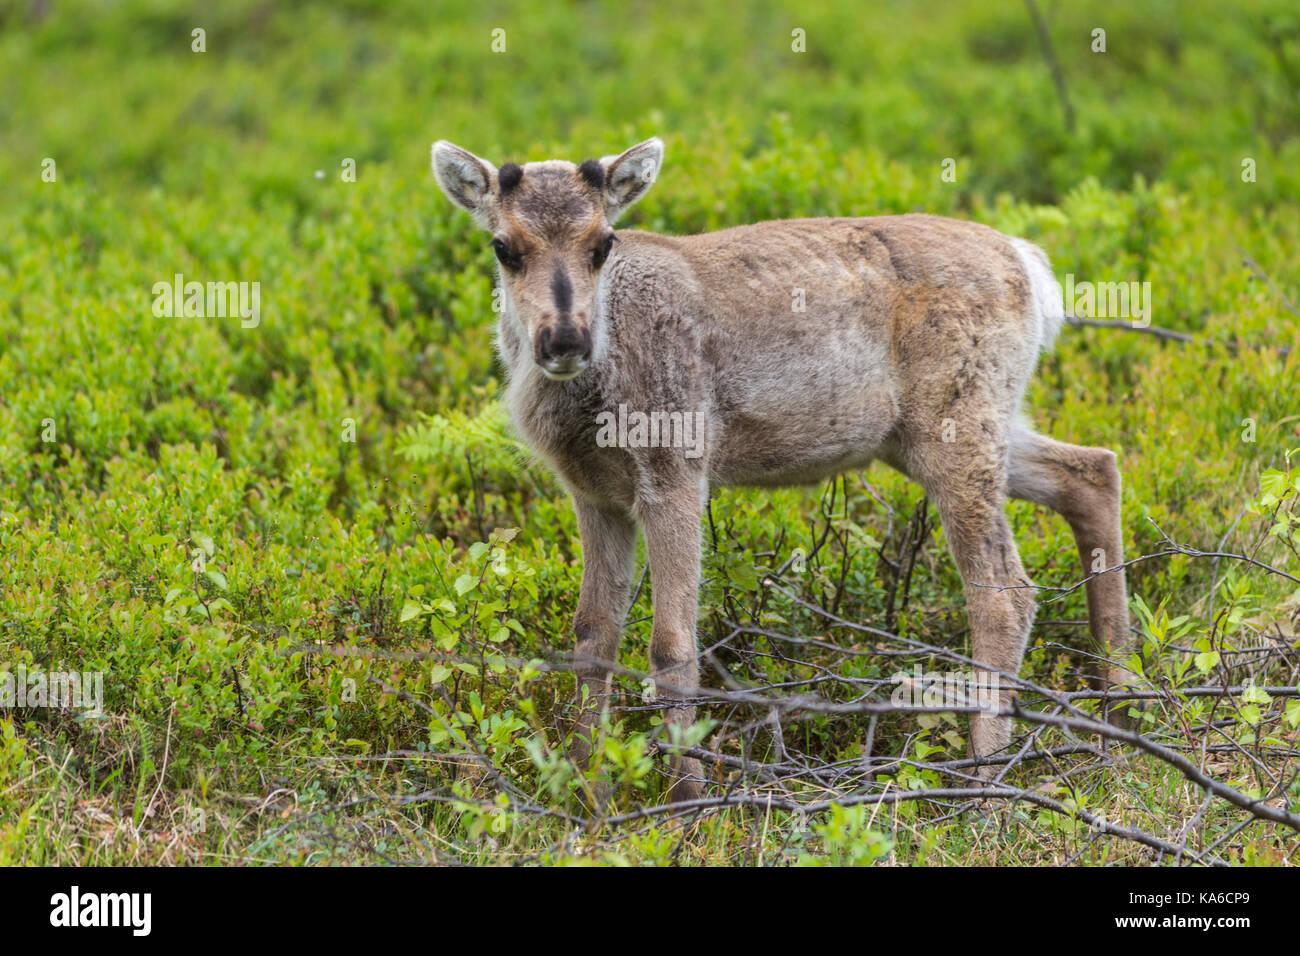 La renna di vitello, rangifer tarandus, Gällivare, Lapponia svedese, Svezia Immagini Stock